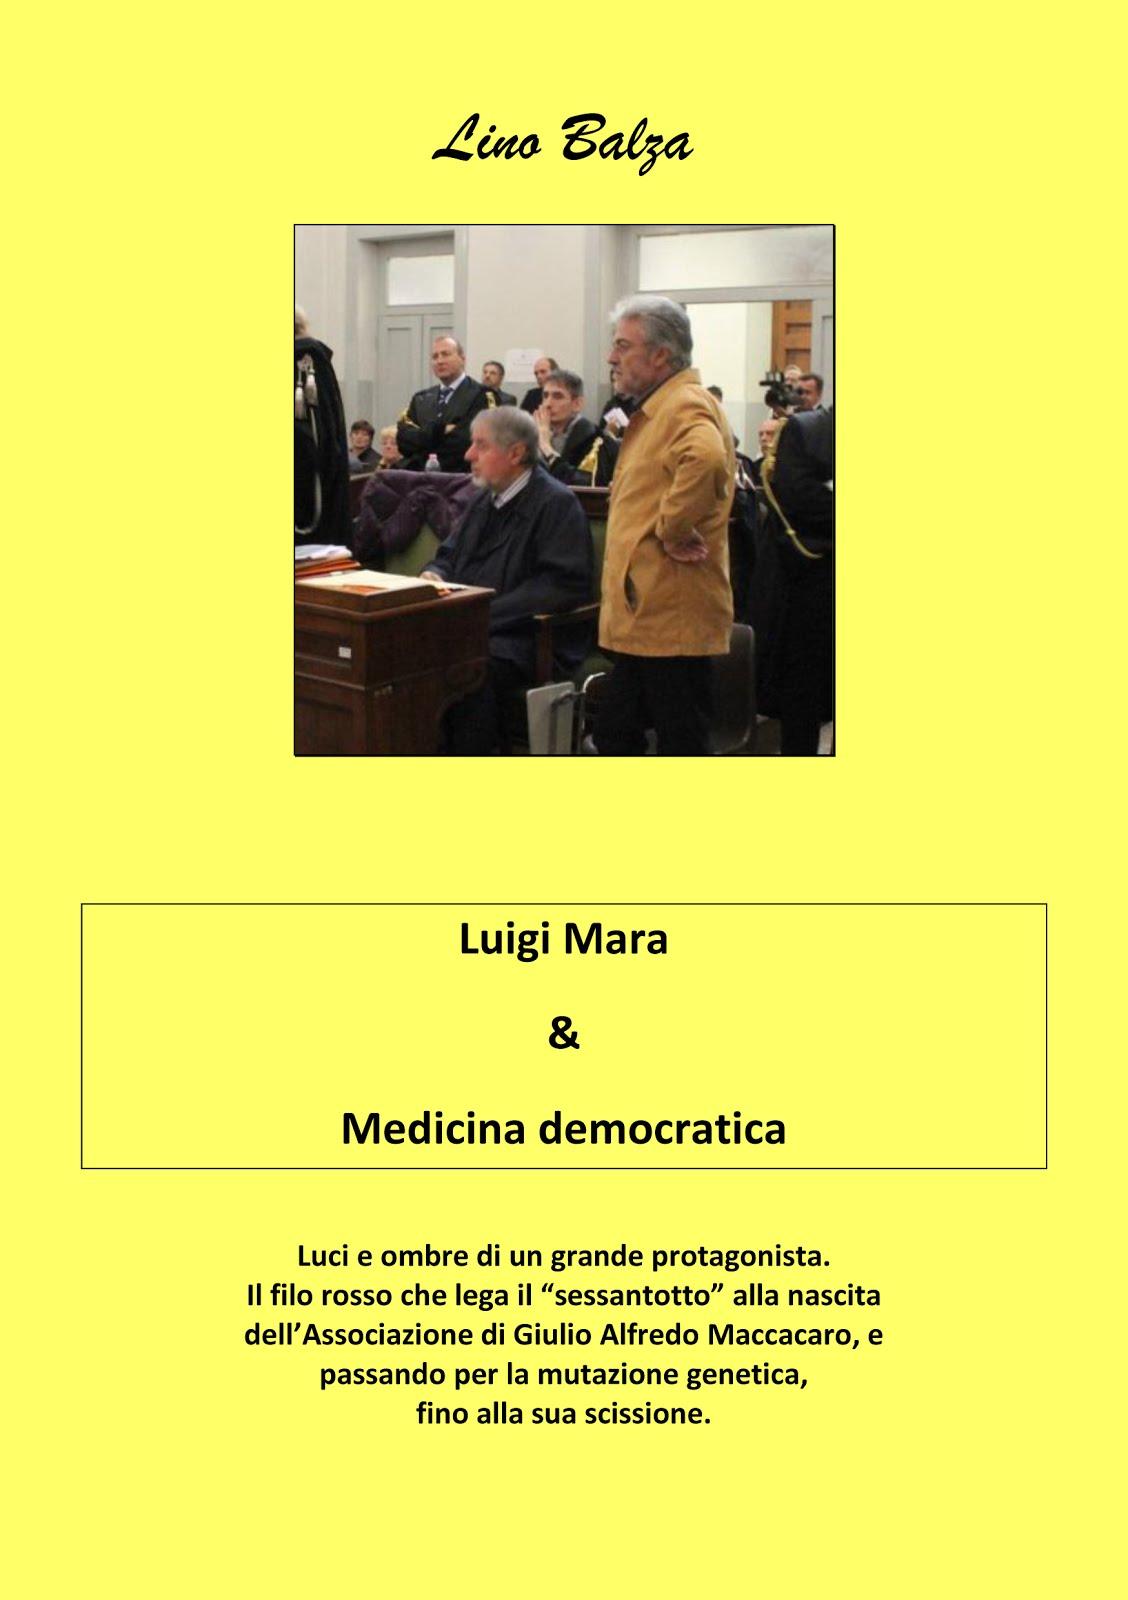 Luigi Mara & Medicina democratica